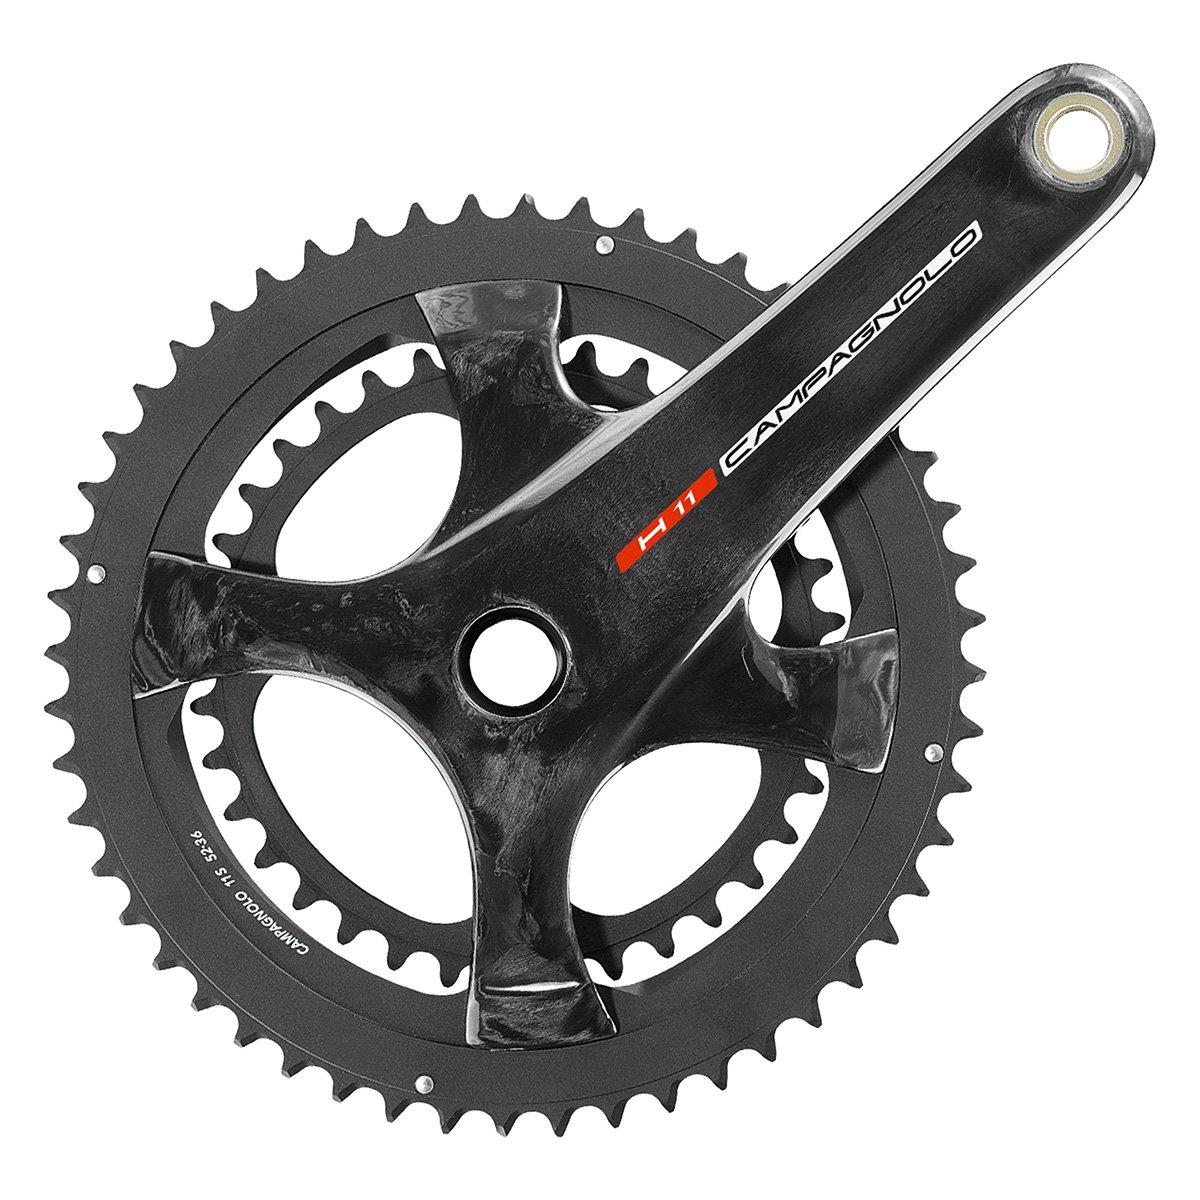 Campagnolo h11 UT 11-speedロード自転車Crankset 175x53-39 ブラック B072FLCMG1